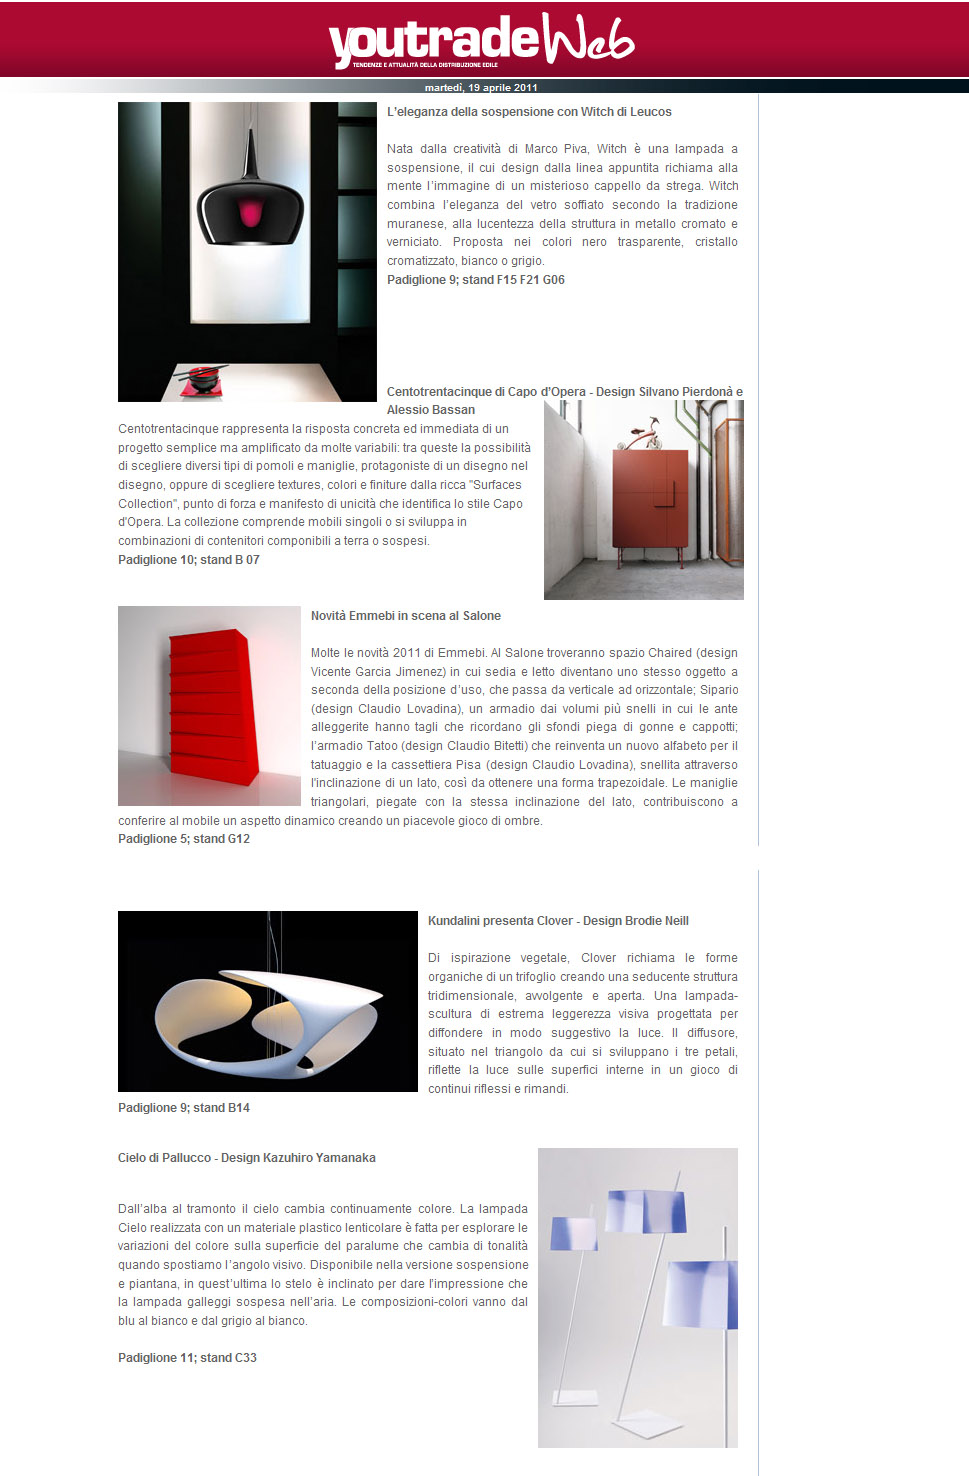 www.youtradebuild.com 19 Aprile 11.jpg